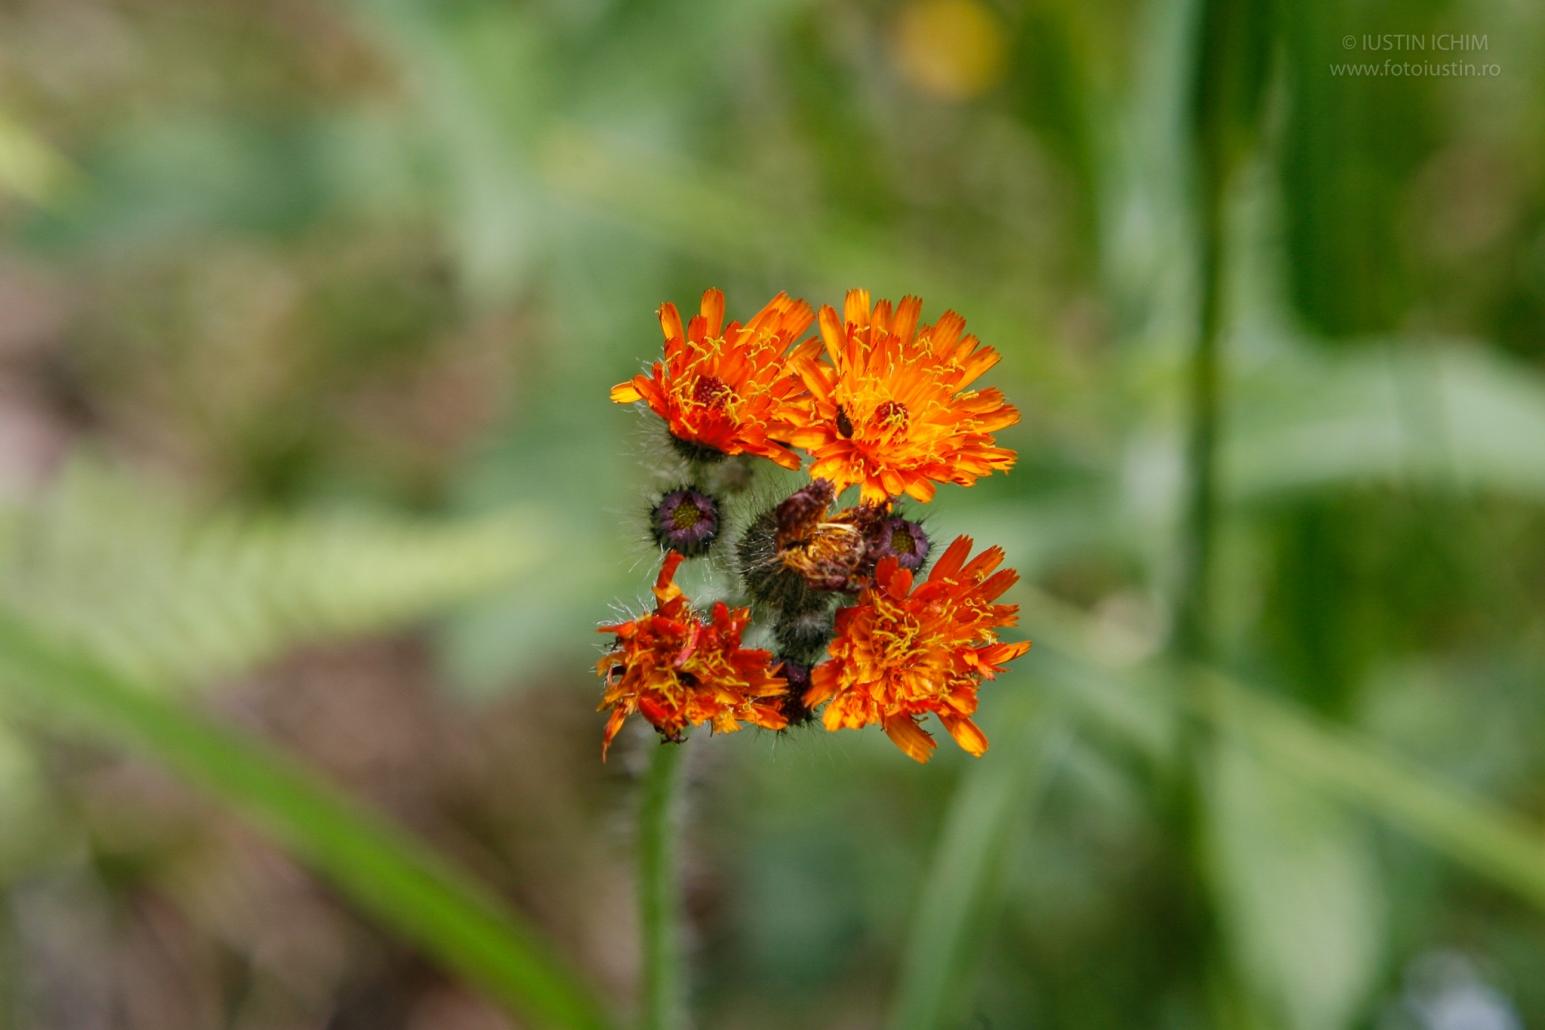 Rușuliță, Hieracium aurantiacum sau Pilosella aurantiaca